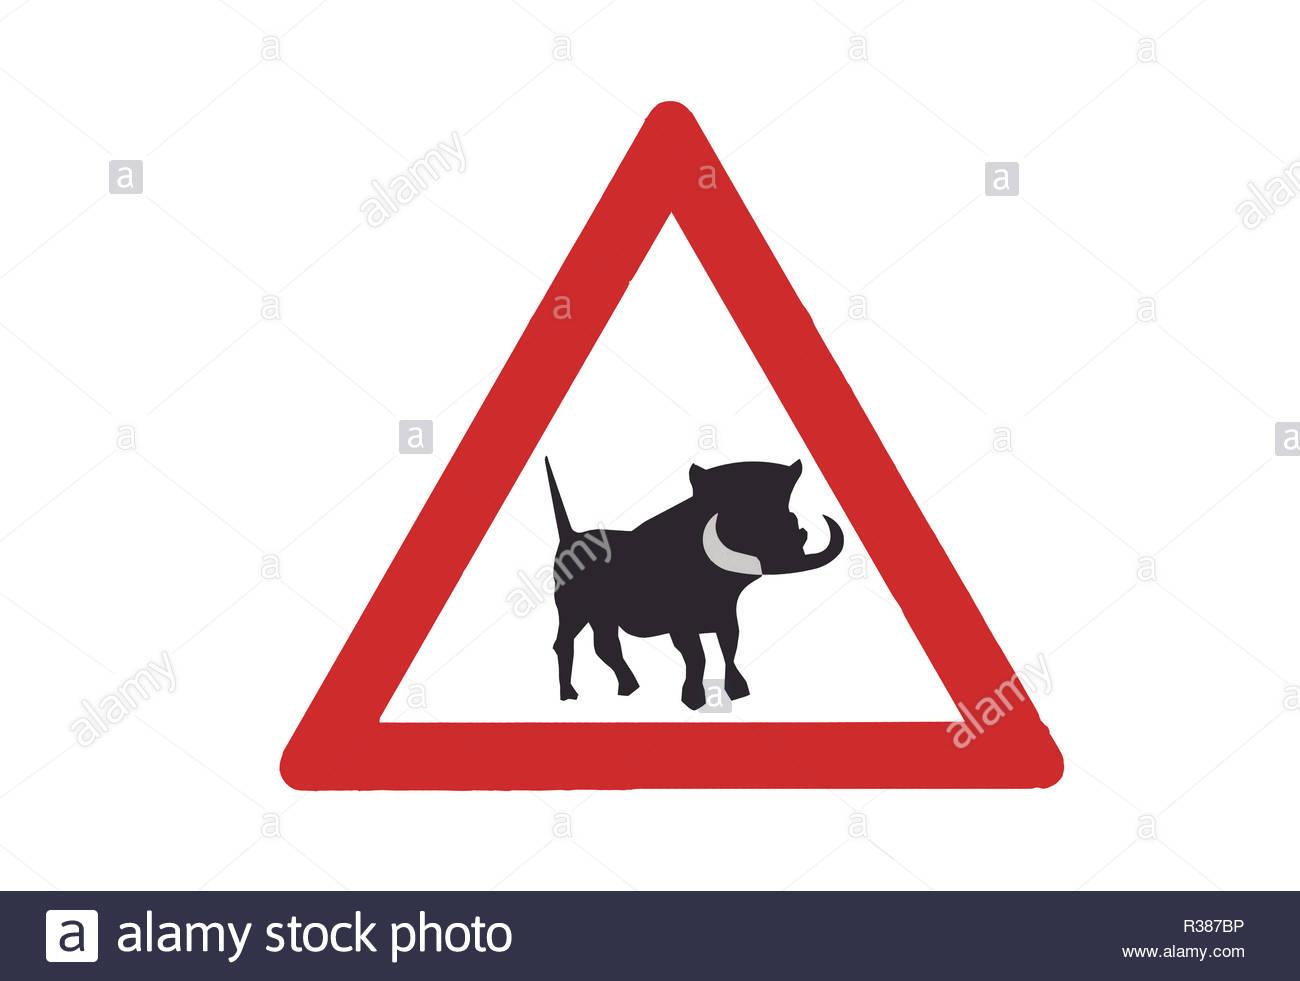 warthog crossing sign - Stock Image